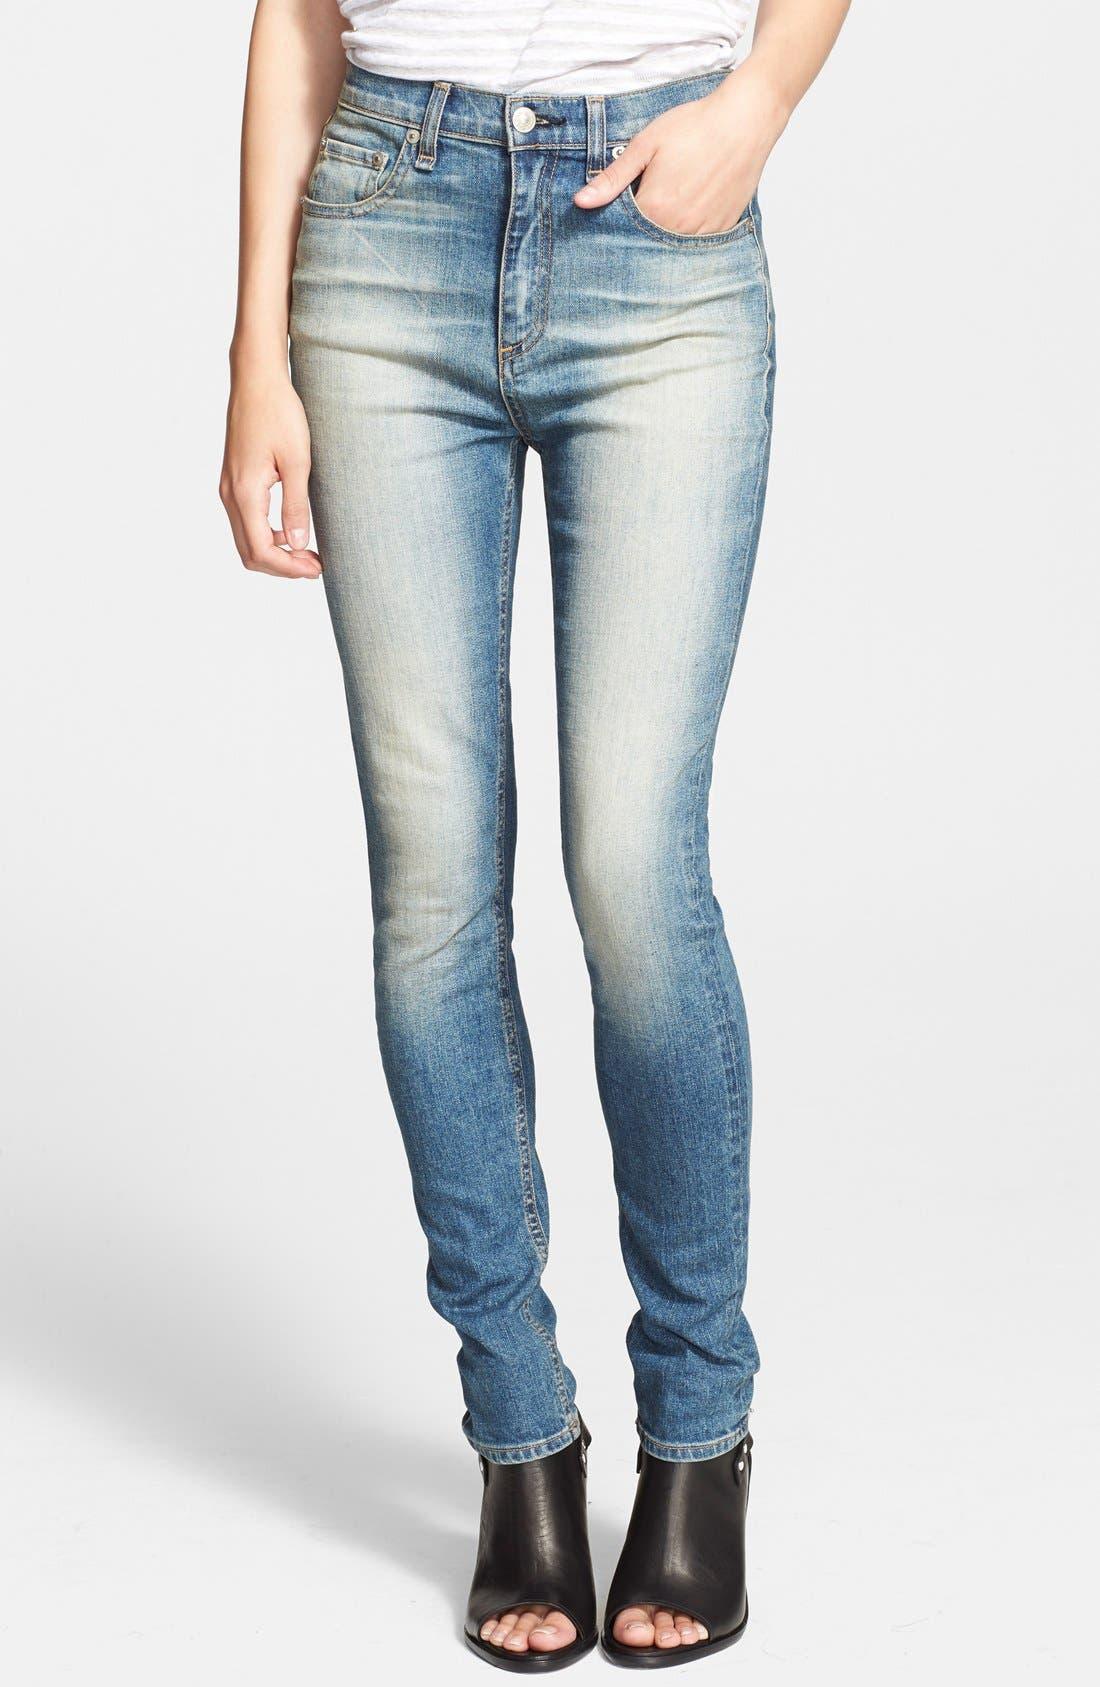 Main Image - rag & bone/JEAN 'The Justine' High Rise Jeans (Surf)